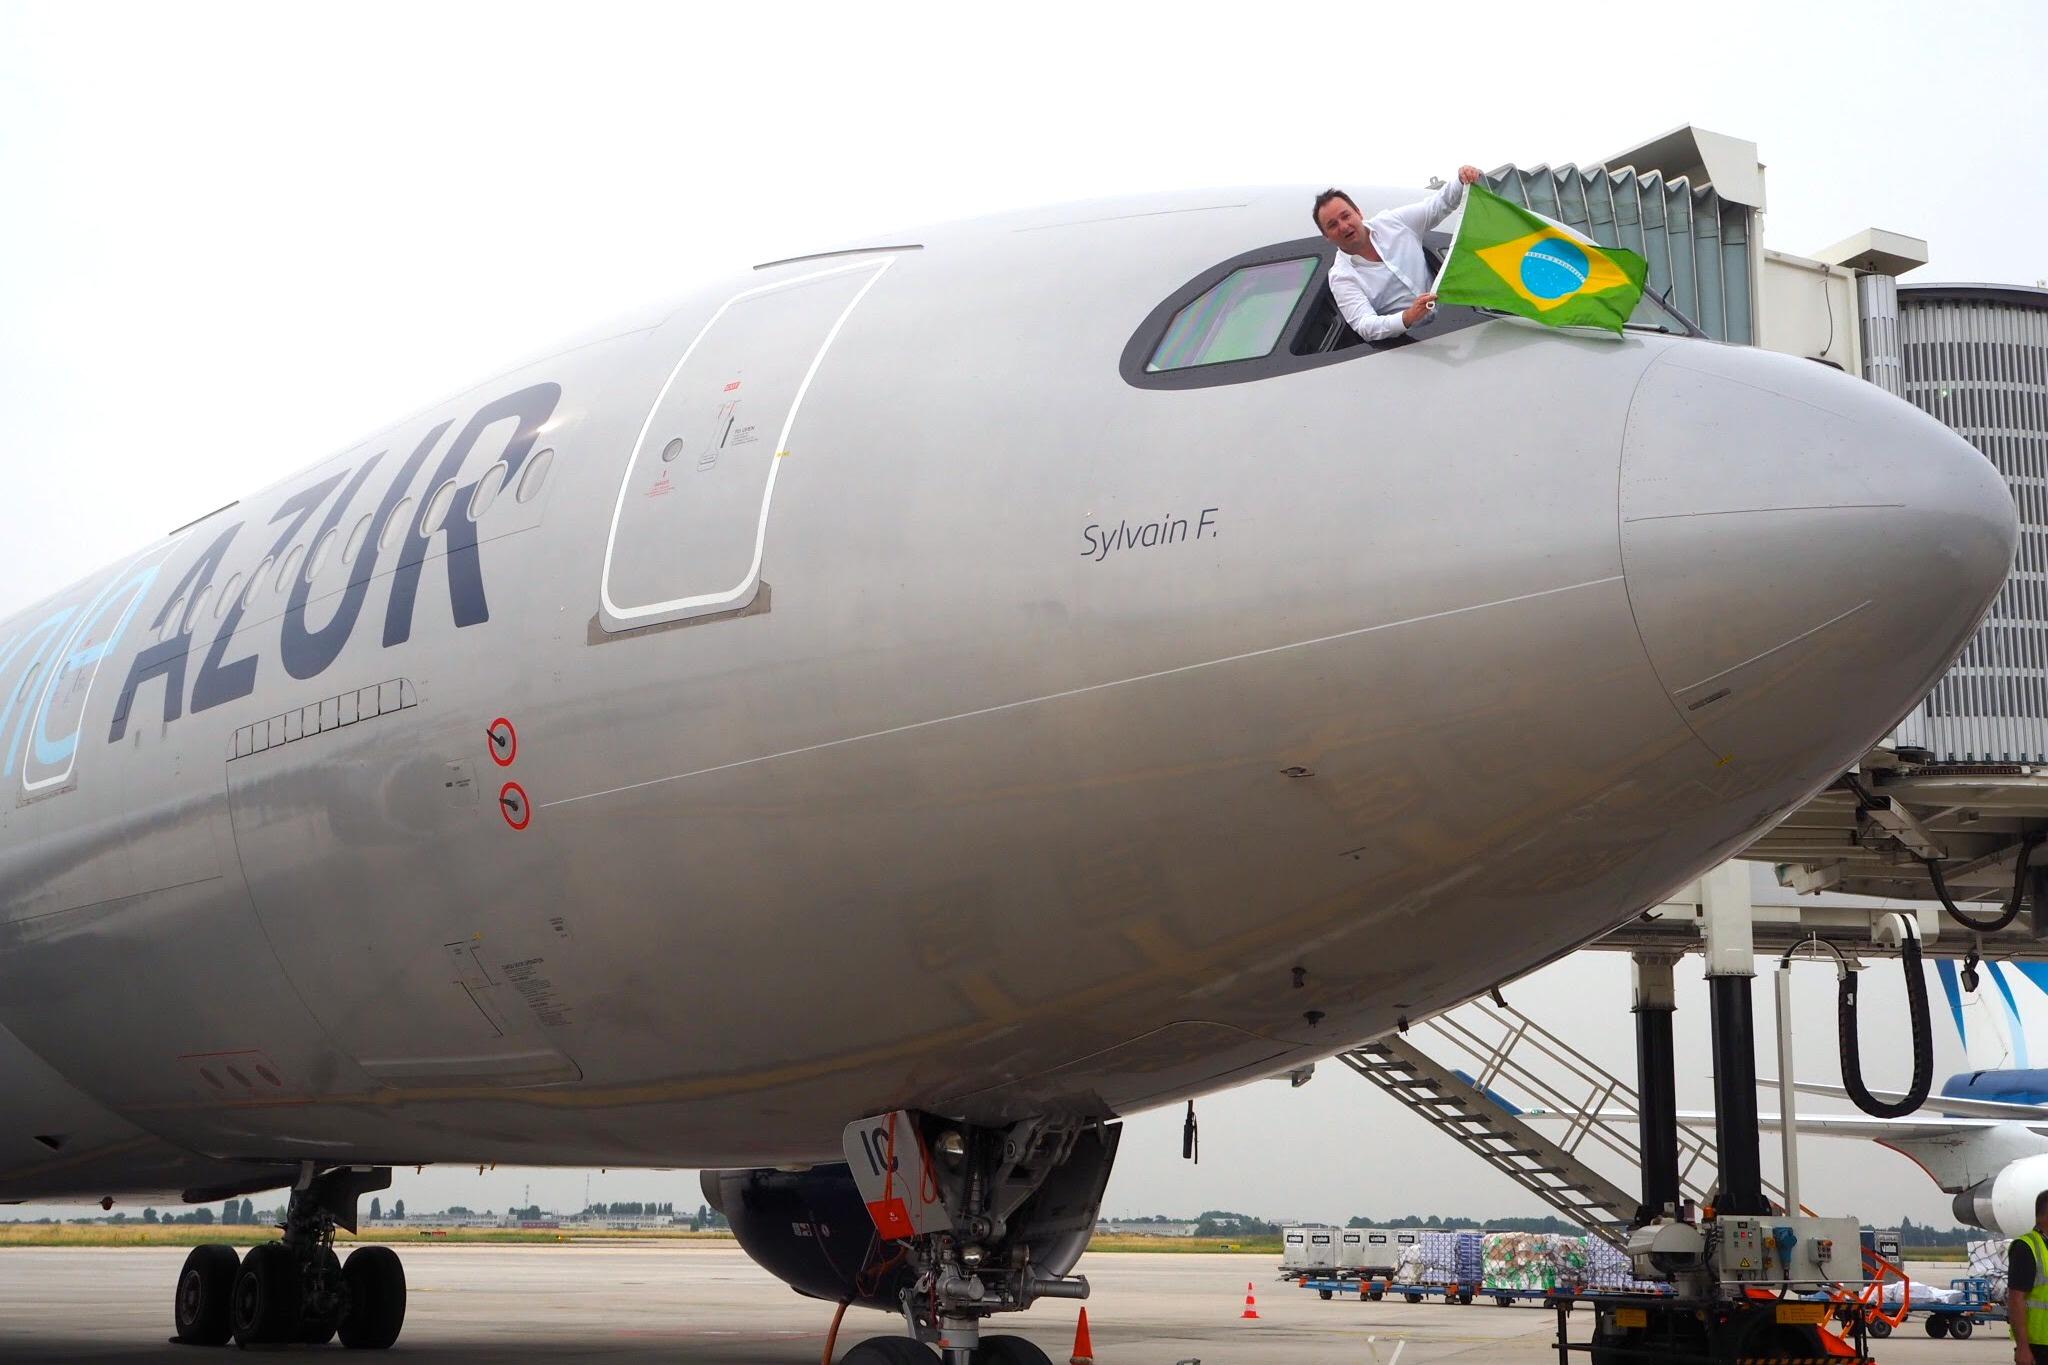 Airbus A330 Aigle Azur - MSN 493 - F-HTIC